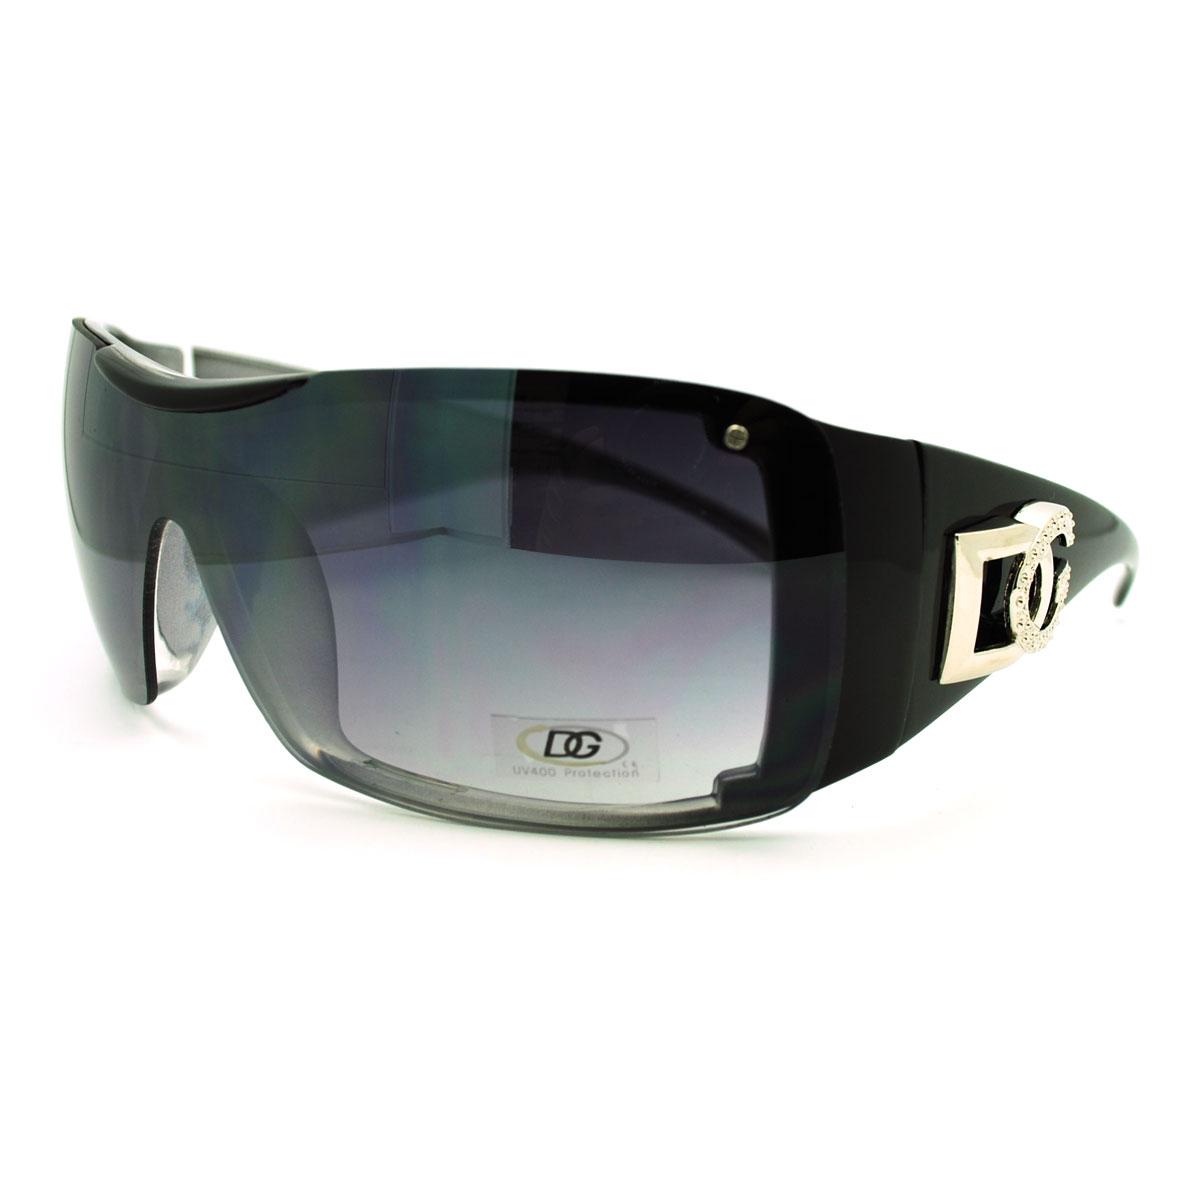 b728655fbc7 D g Rimless Glasses